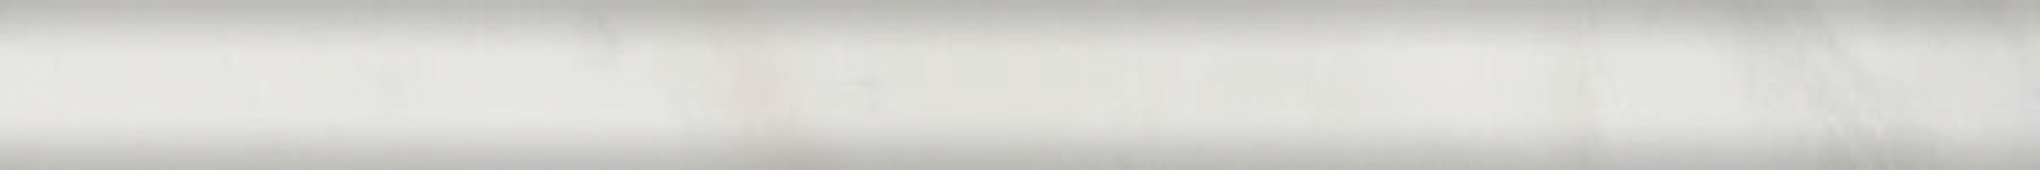 SPA044R Буонарроти белый обрезной 30*2.5 бордюр